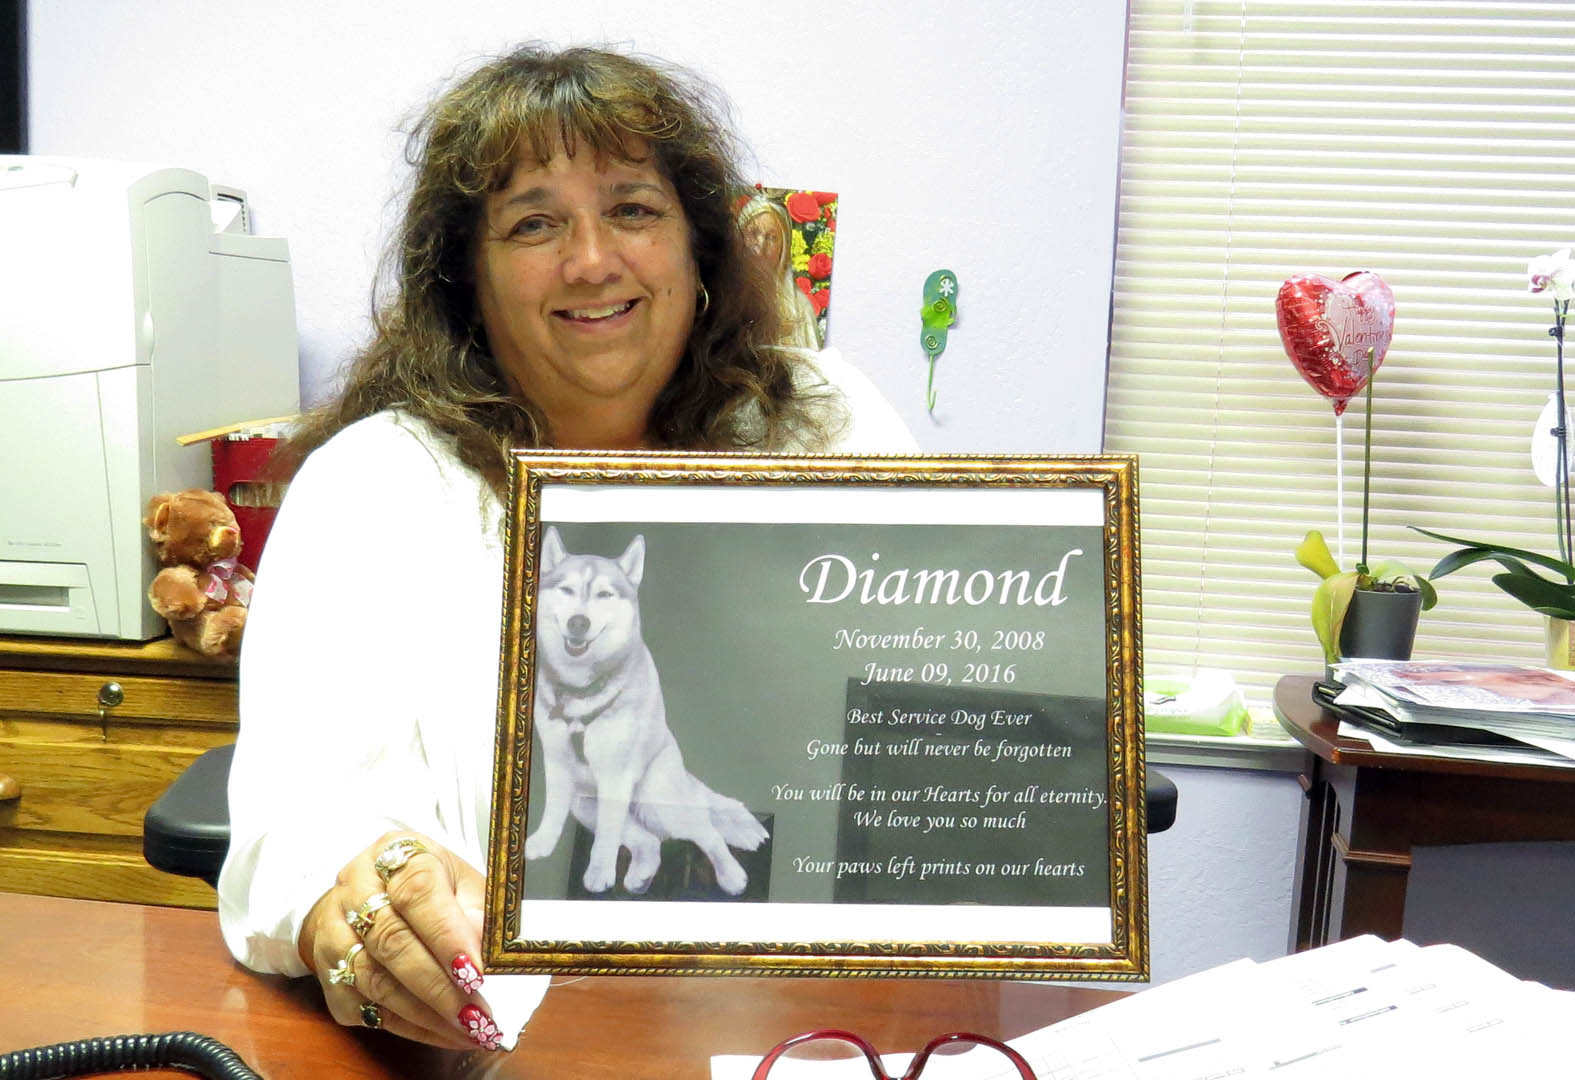 Story: Community creates gofundme page after death of beloved service dog